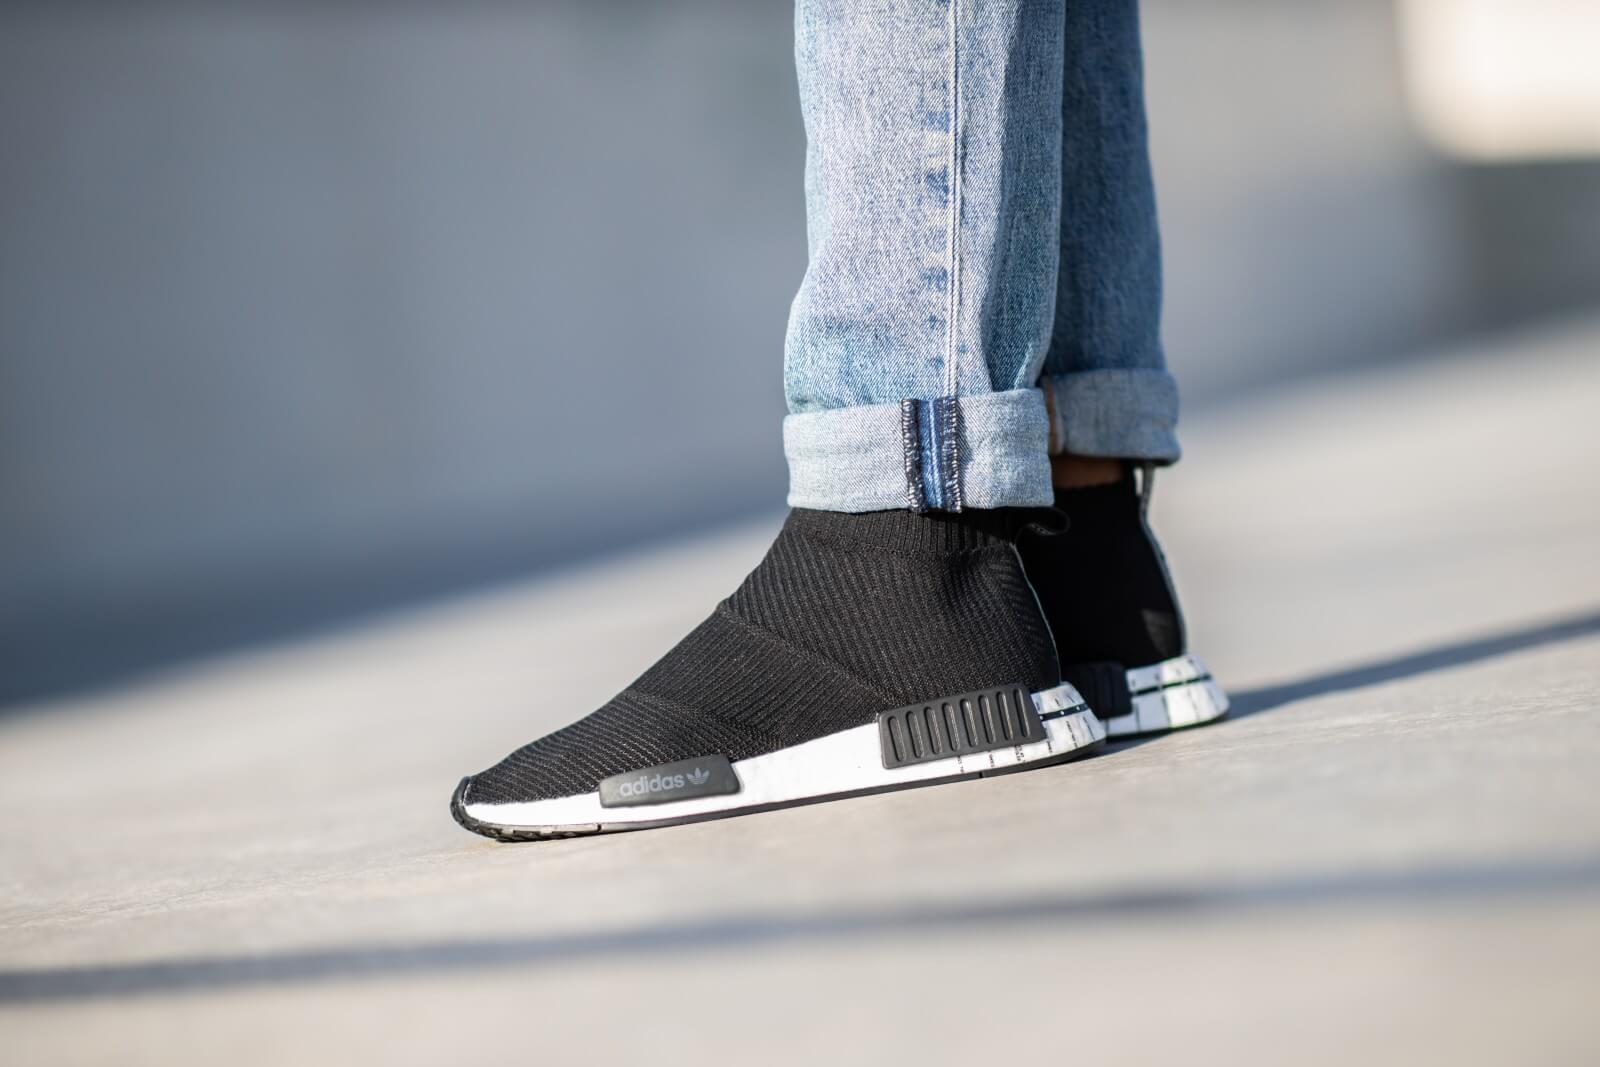 Adidas NMD City Sock 1 Primeknit BlackWhite BD7733